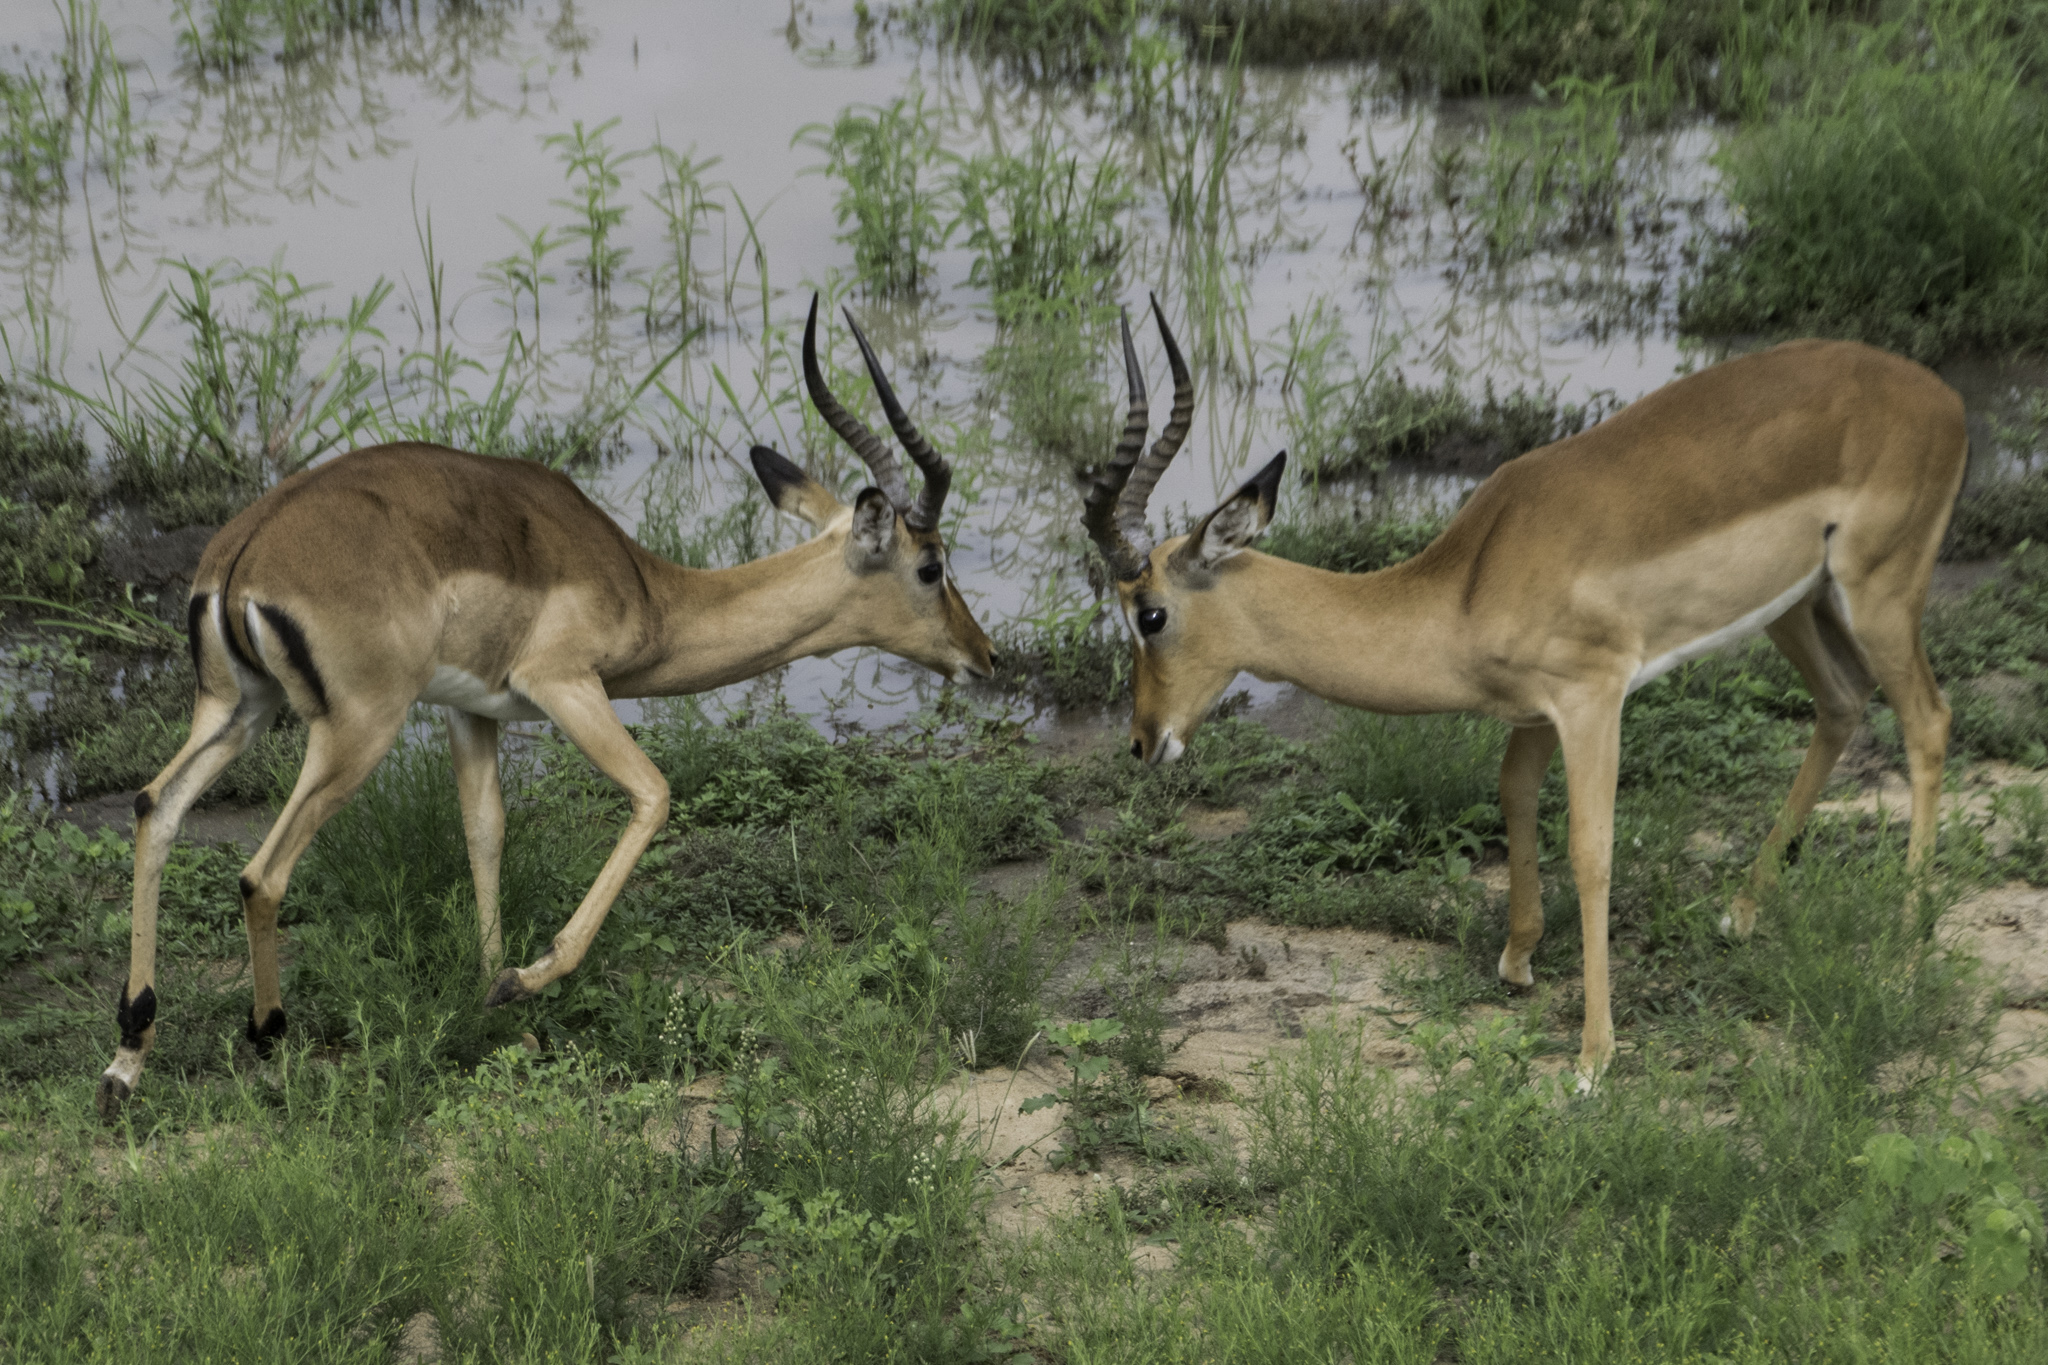 Spielfreudige Impala-Antilopen